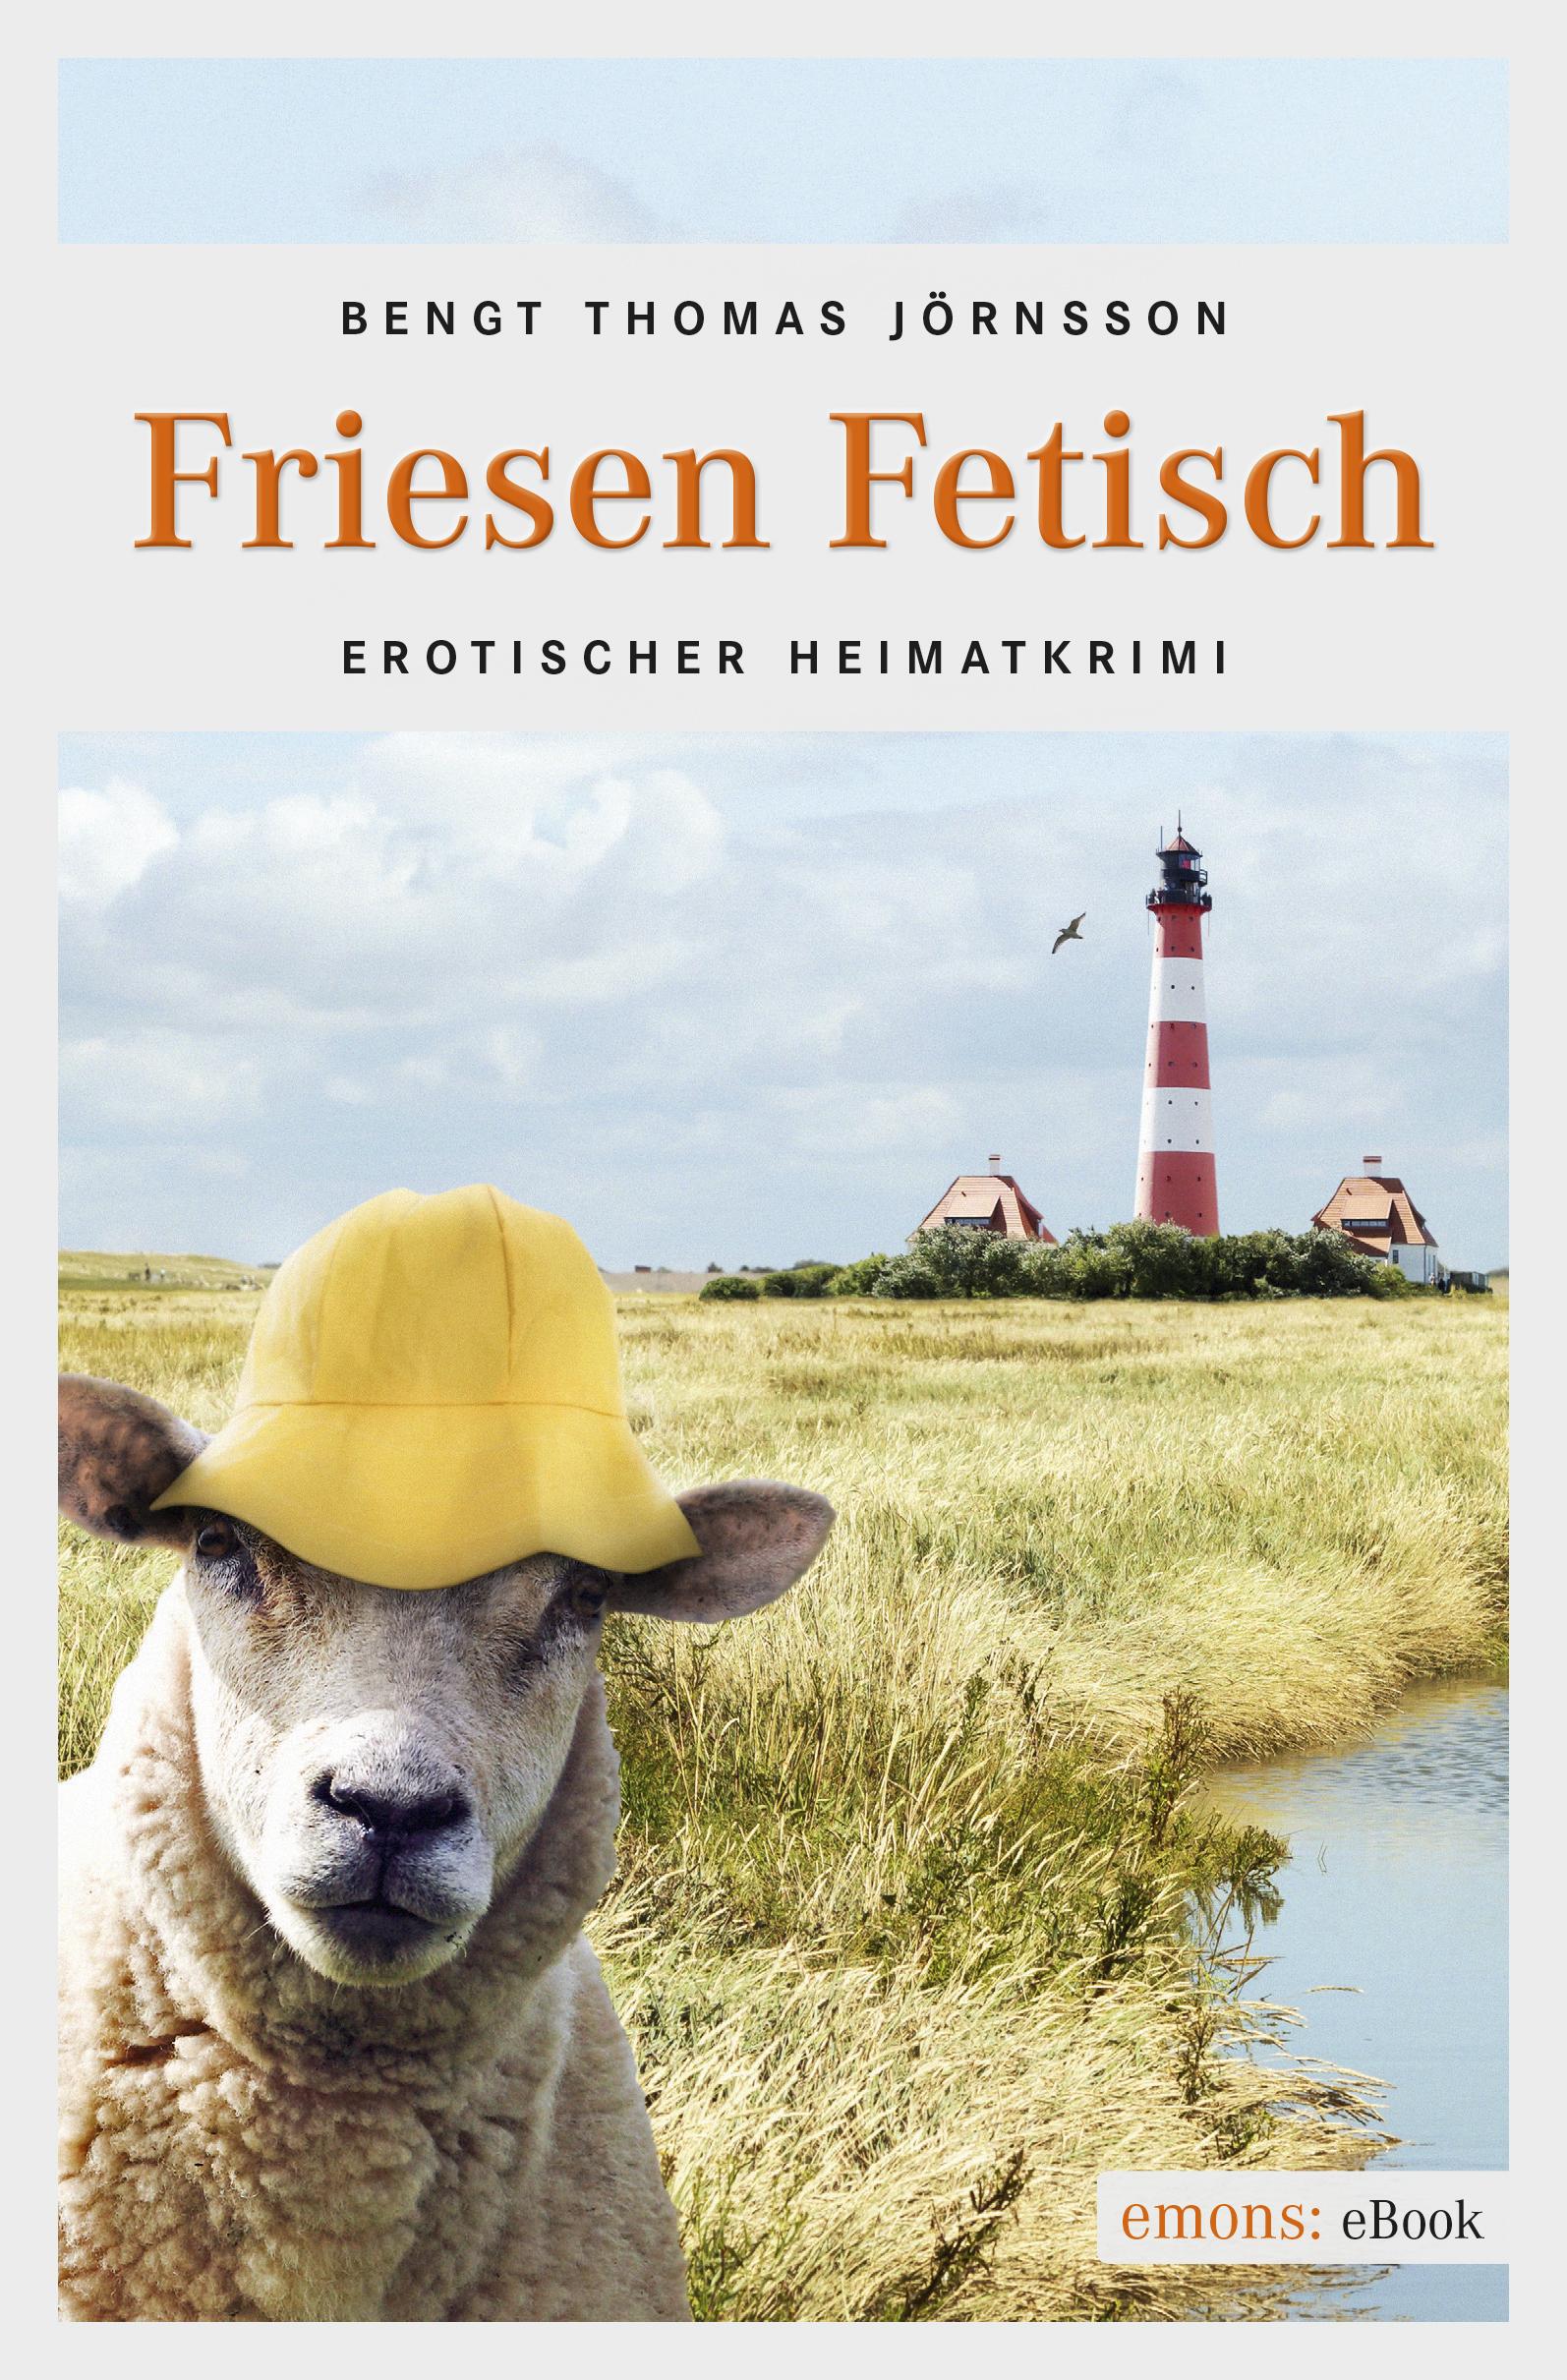 Bengt Thomas Jornsson Friesen Fetisch